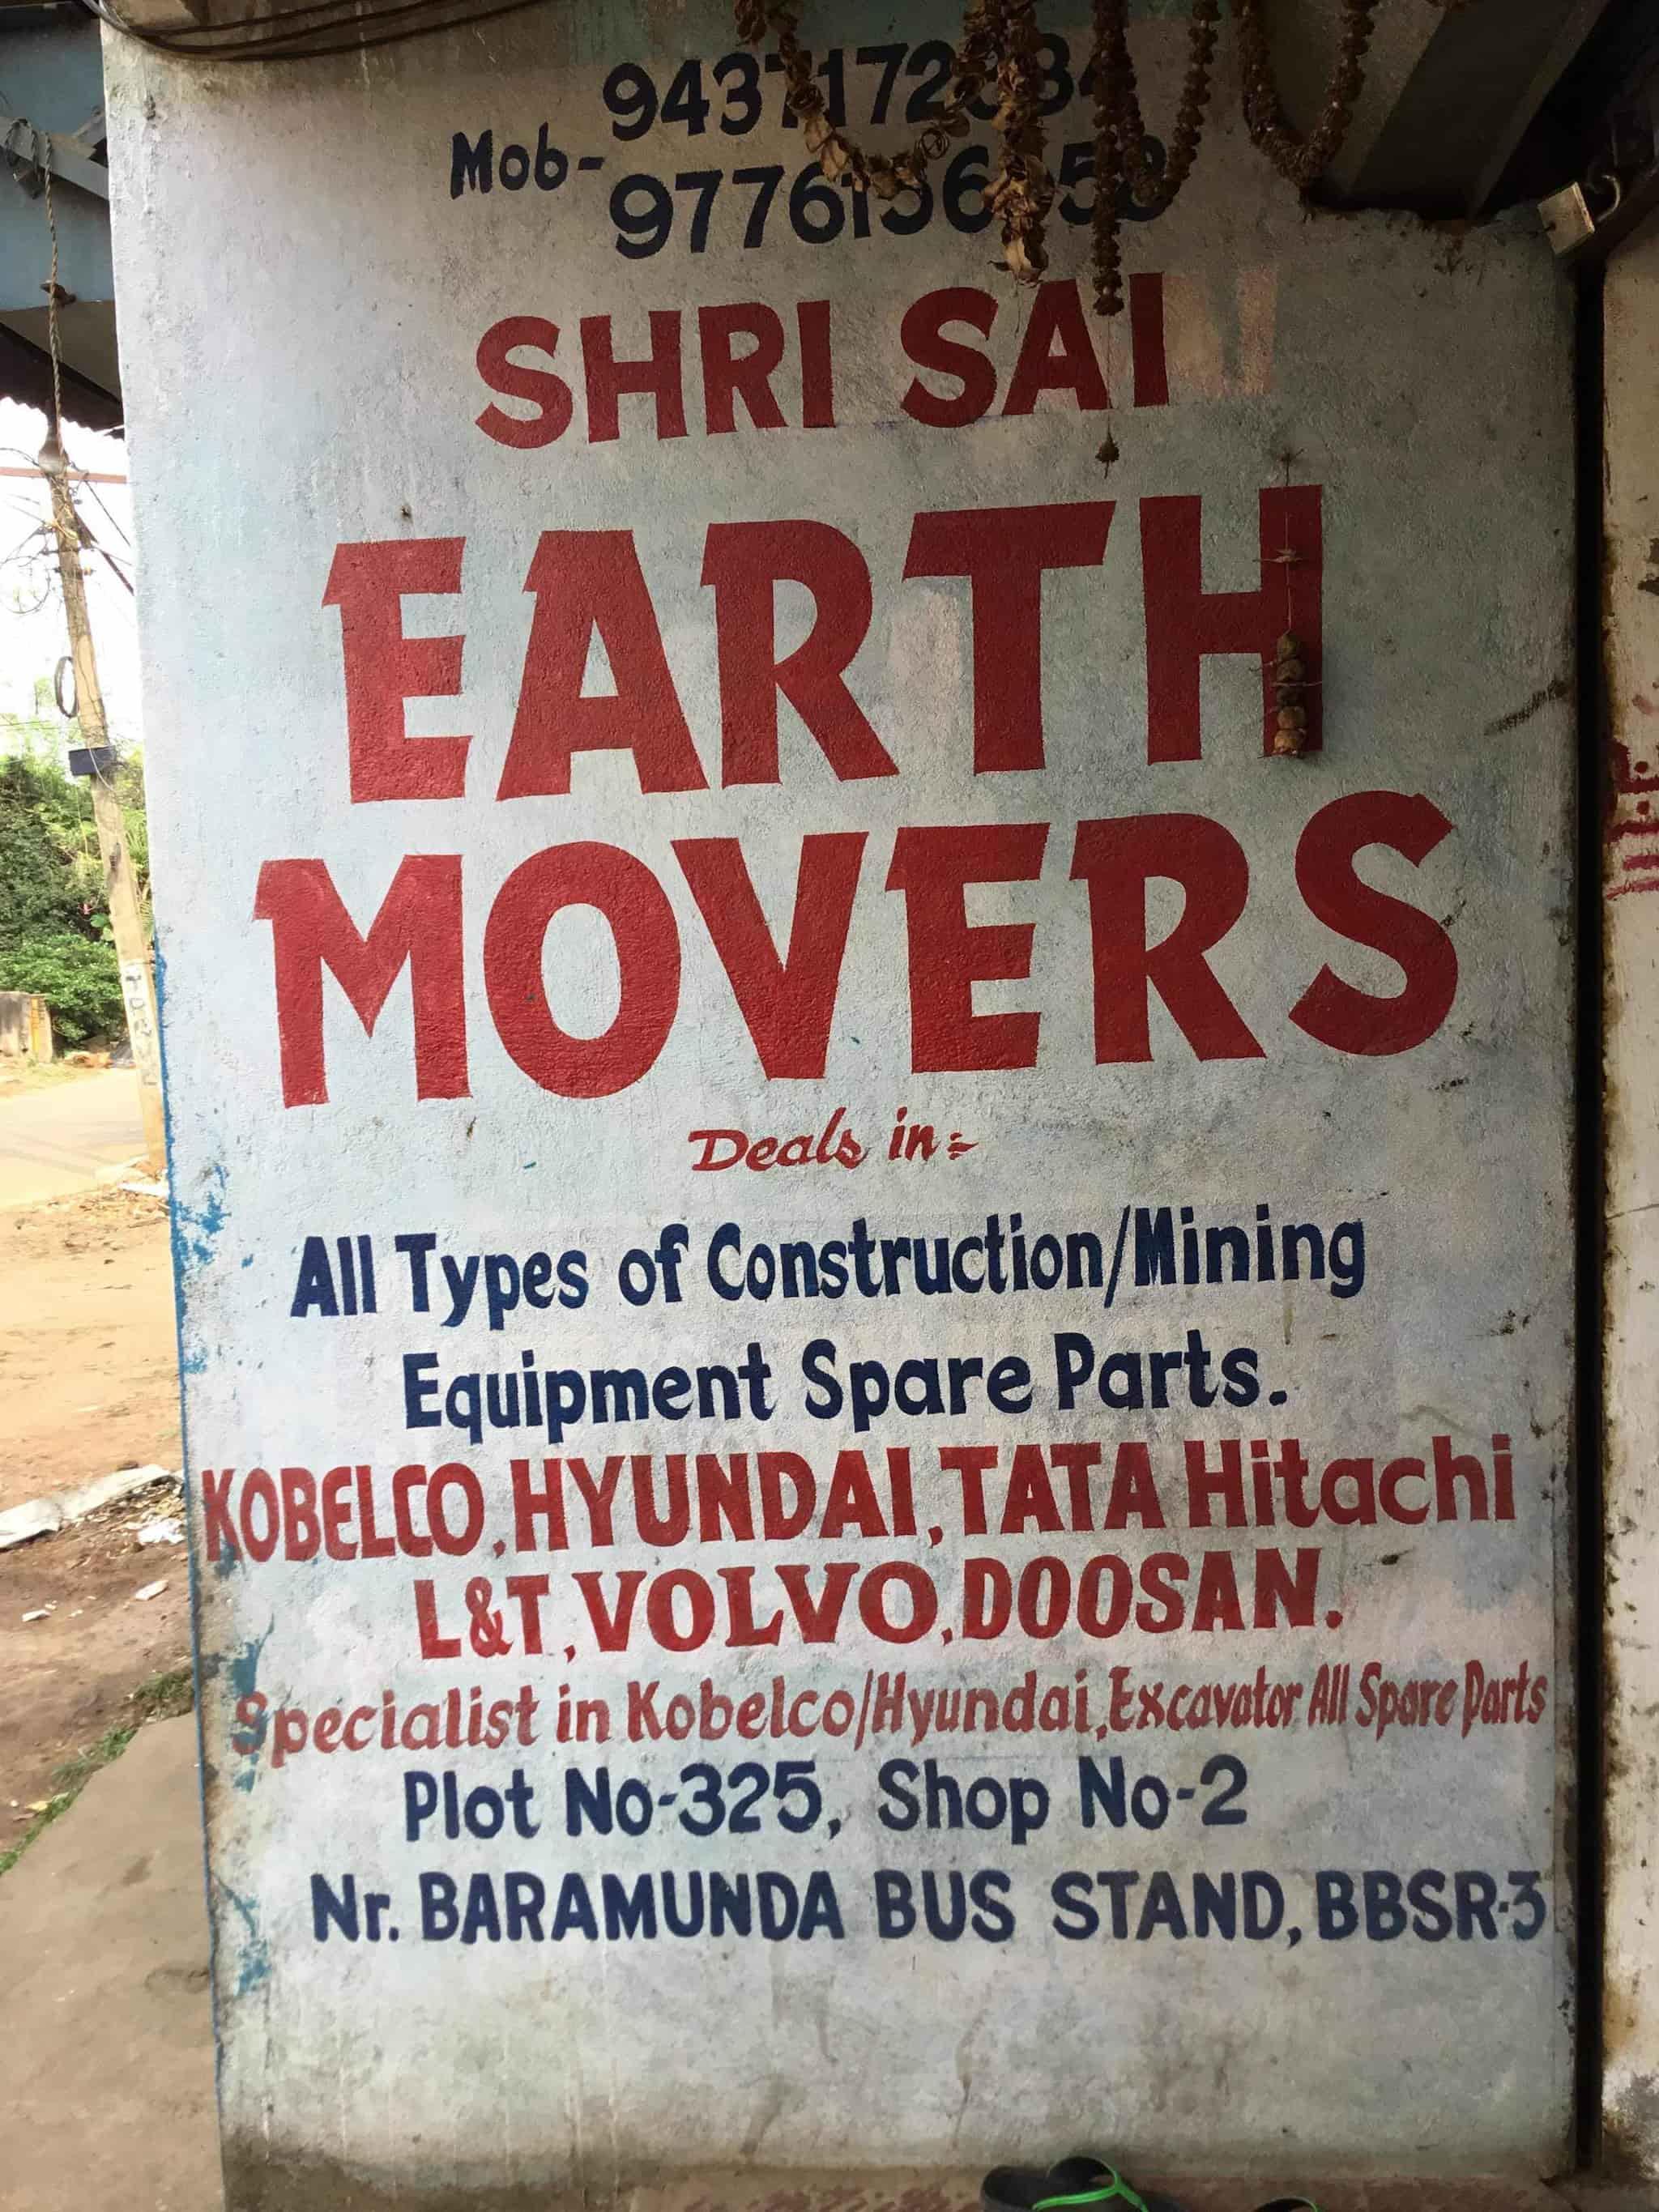 Shri Sai Earth Movers Photos, Baramunda Colony, Bhubaneshwar